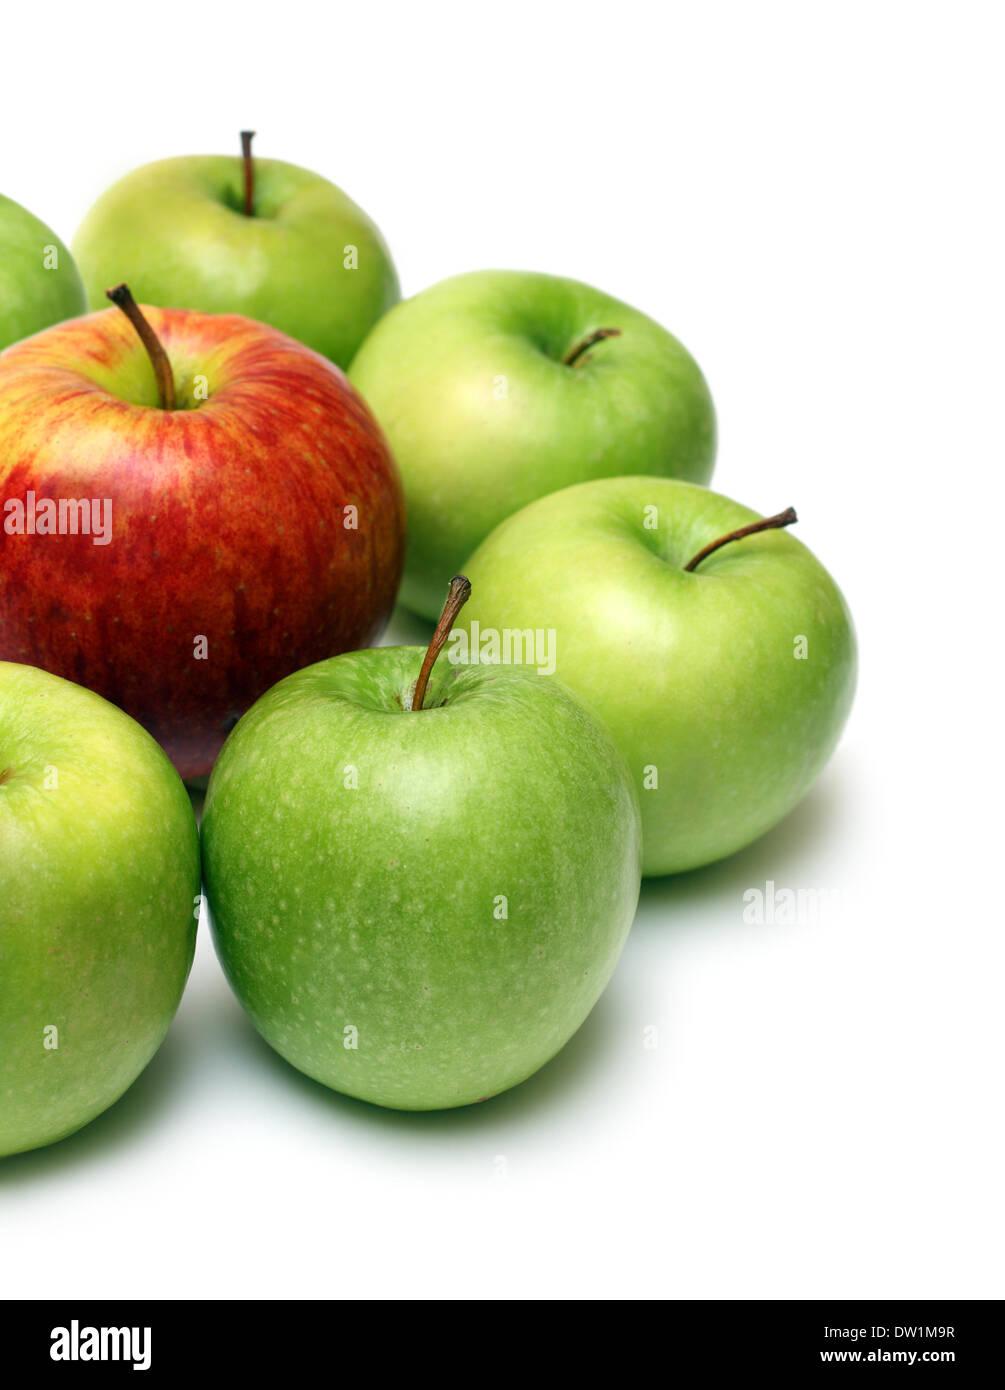 anderes Konzept mit Äpfeln Stockbild